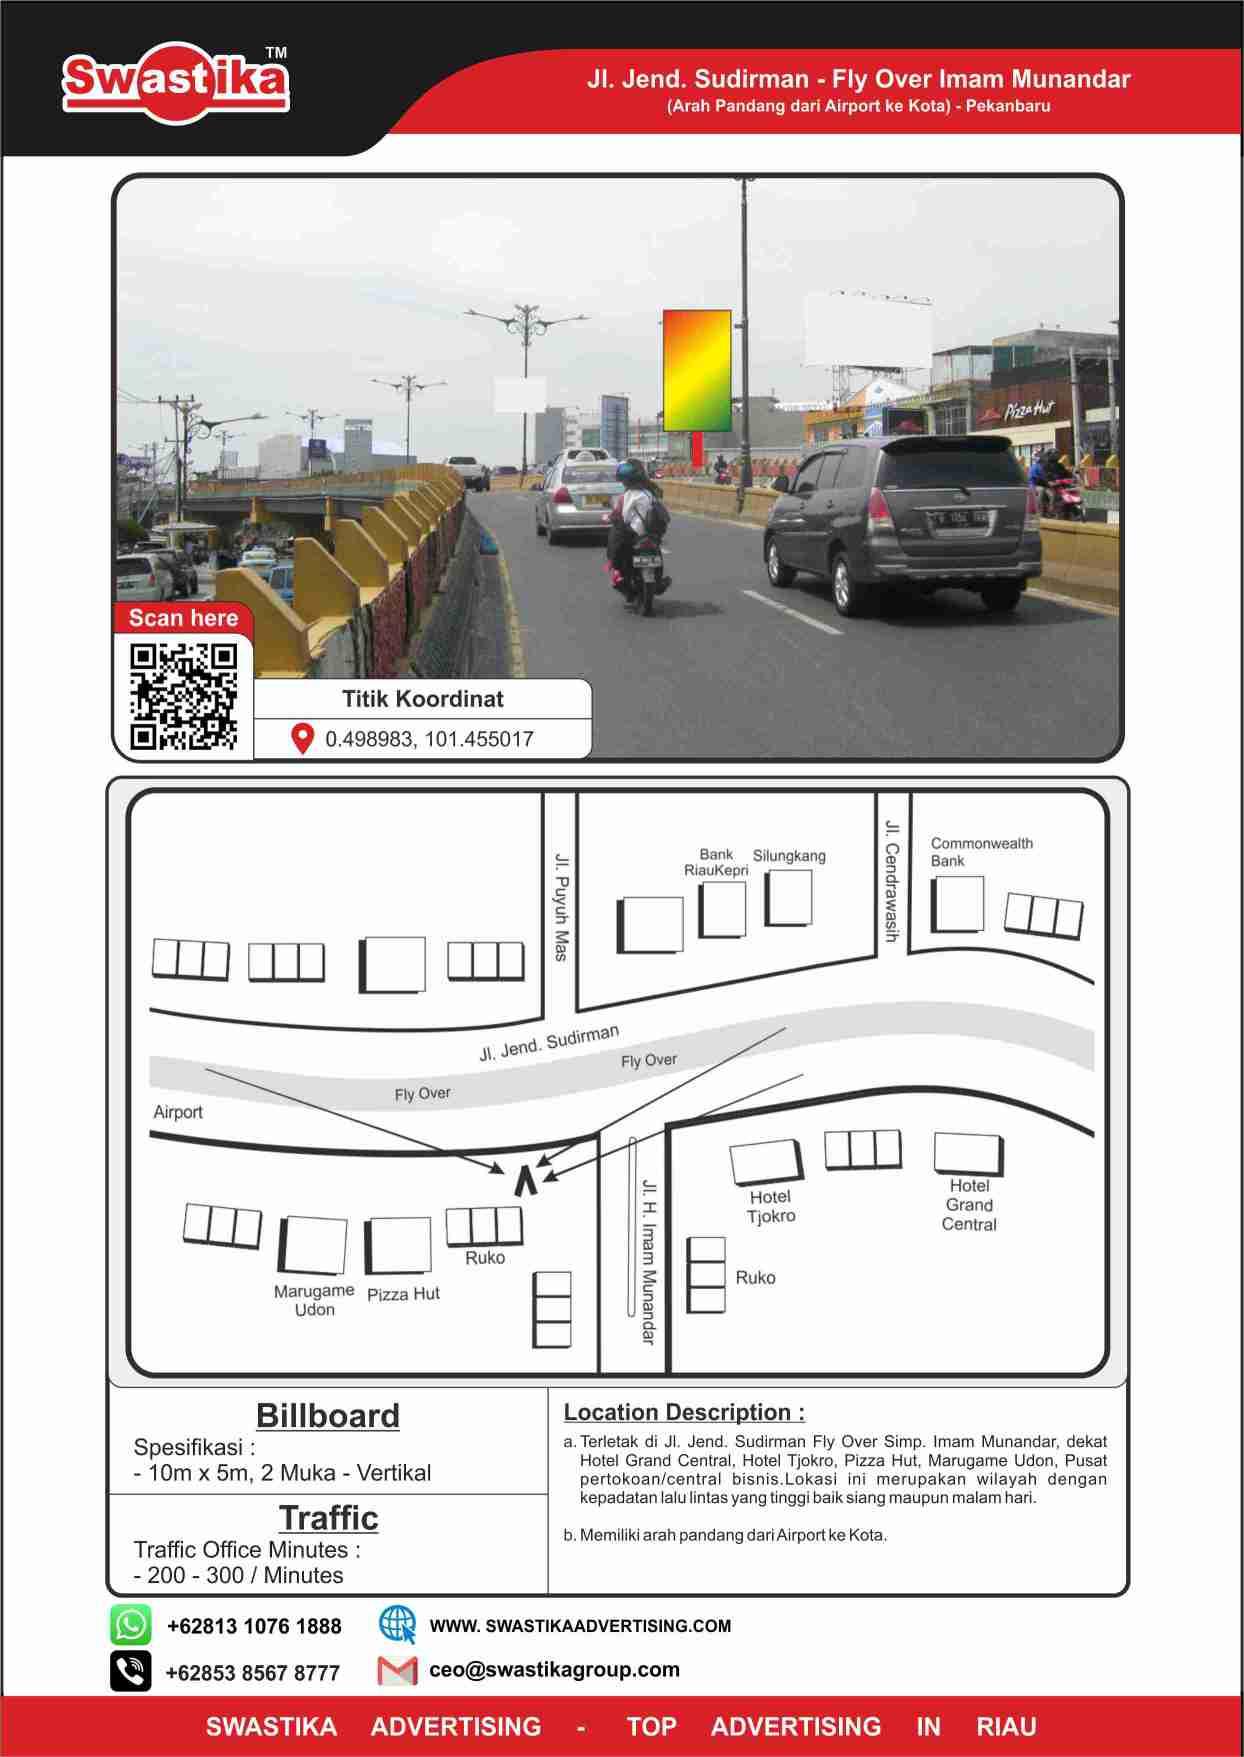 Jl Jend Sudirman Fly Over Imam Munandar (Arah dari Airport ke Kota)